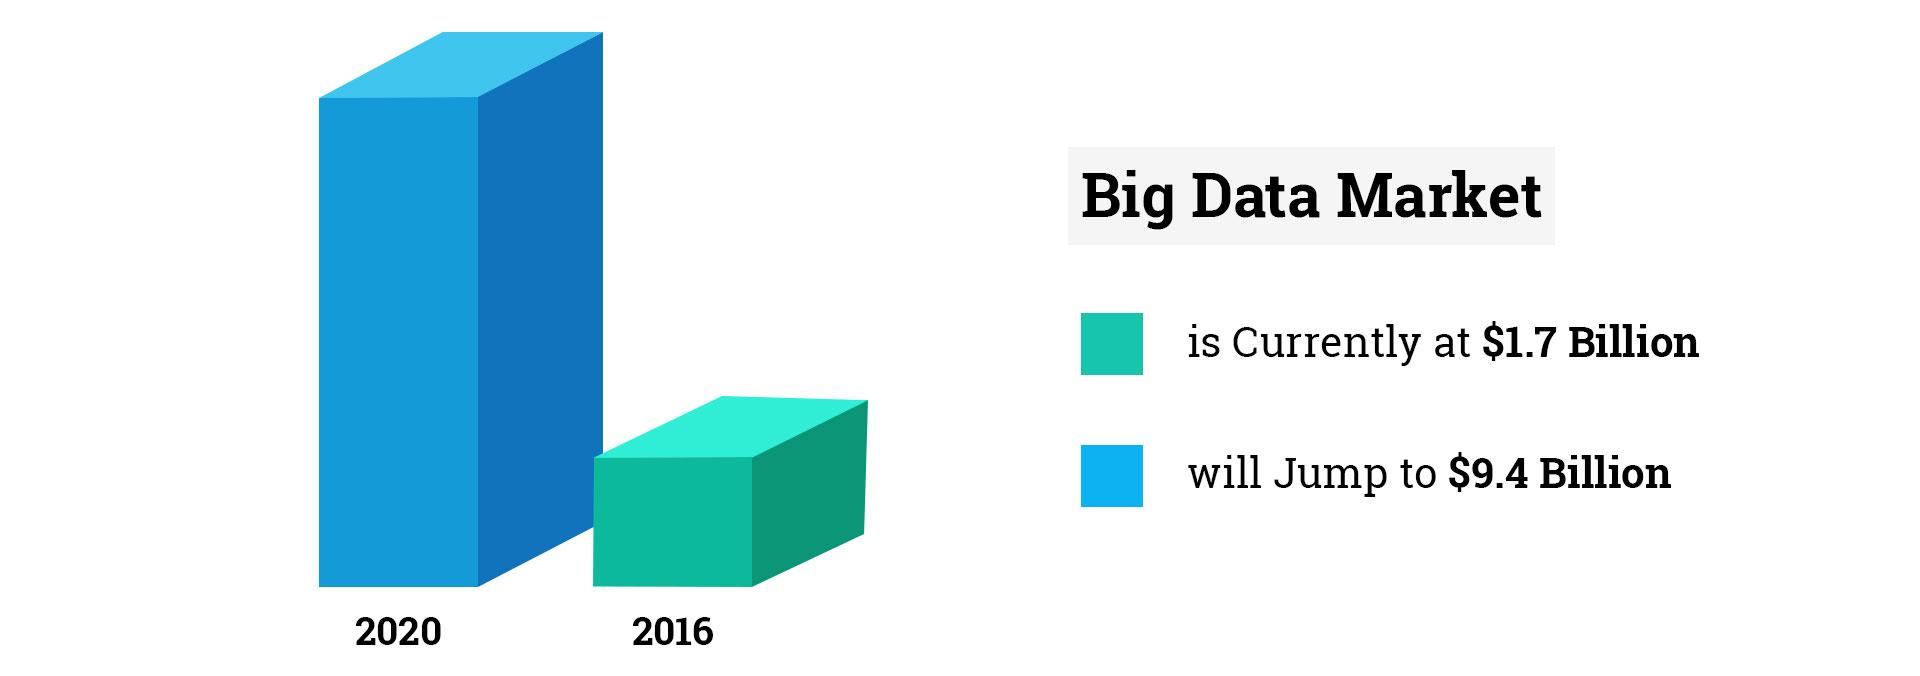 prediction-of-big-data-market